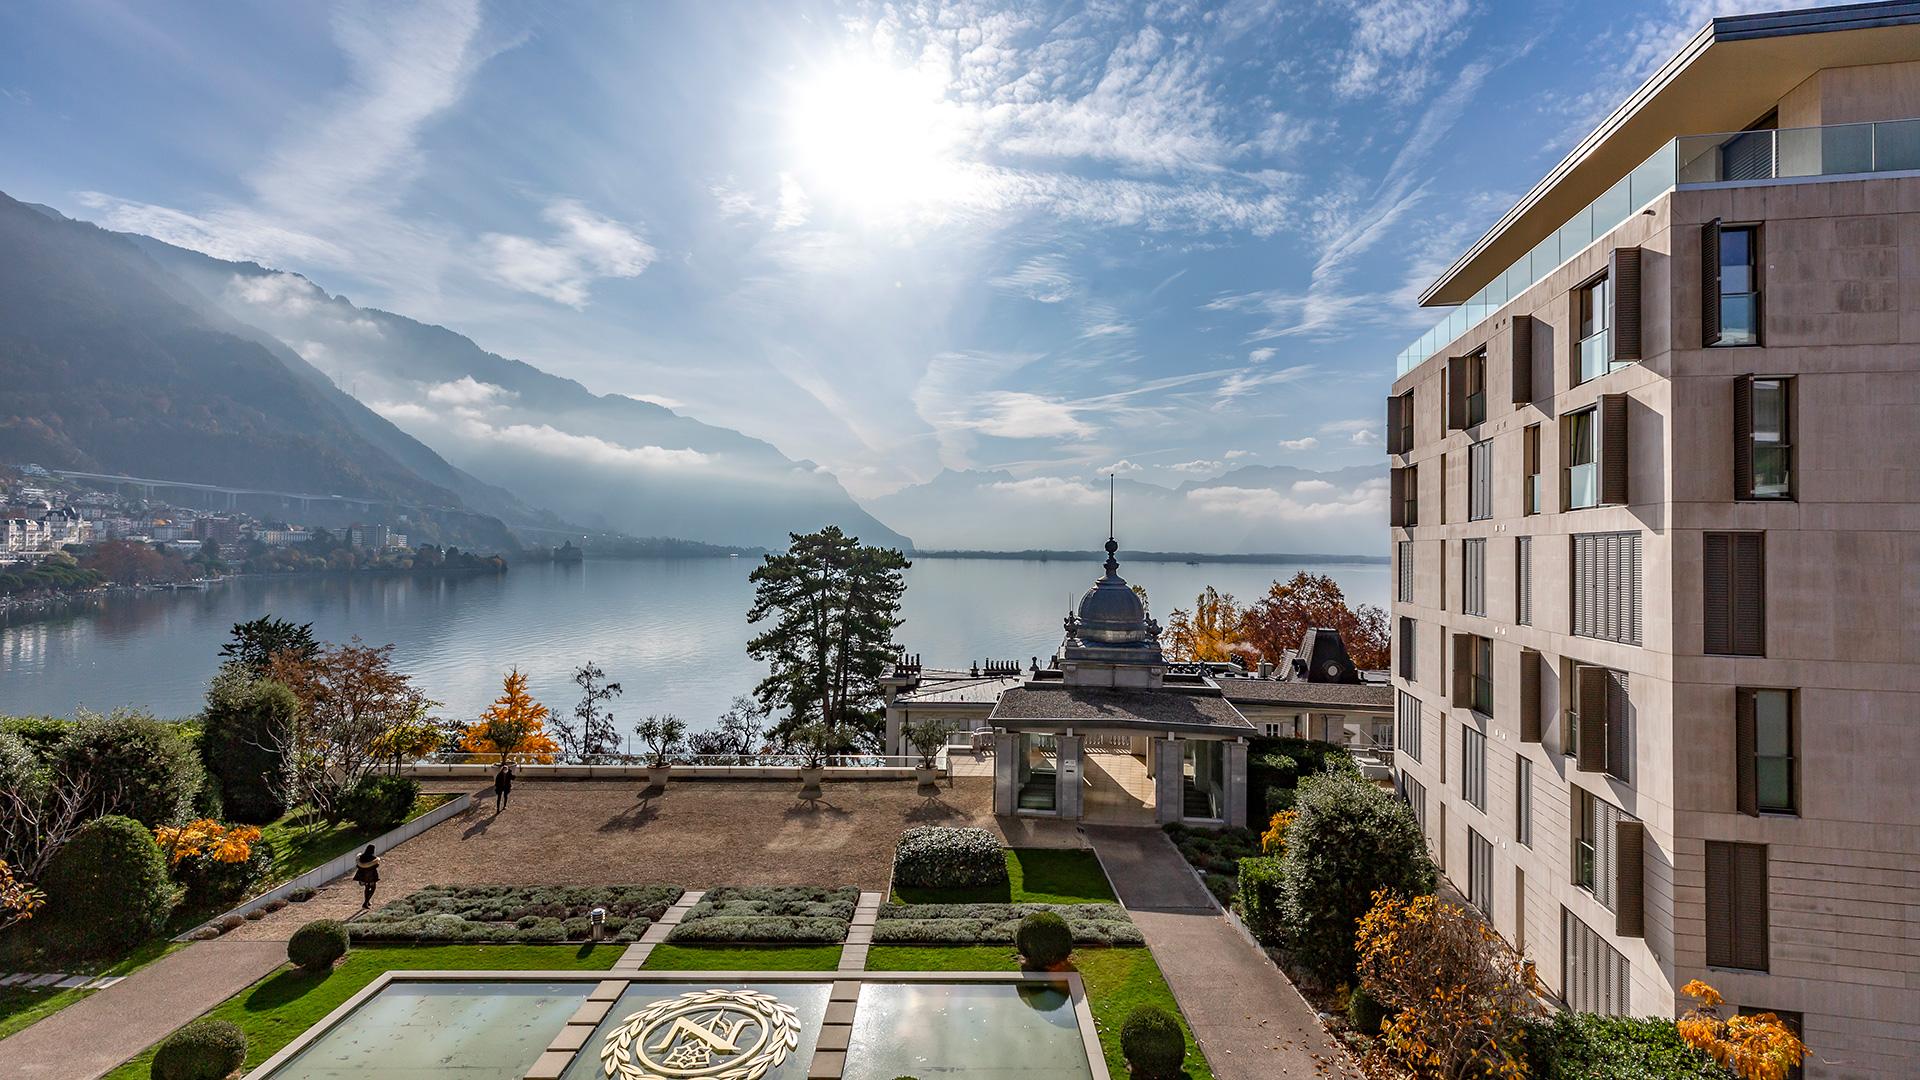 Le National 3 Apartments, Switzerland